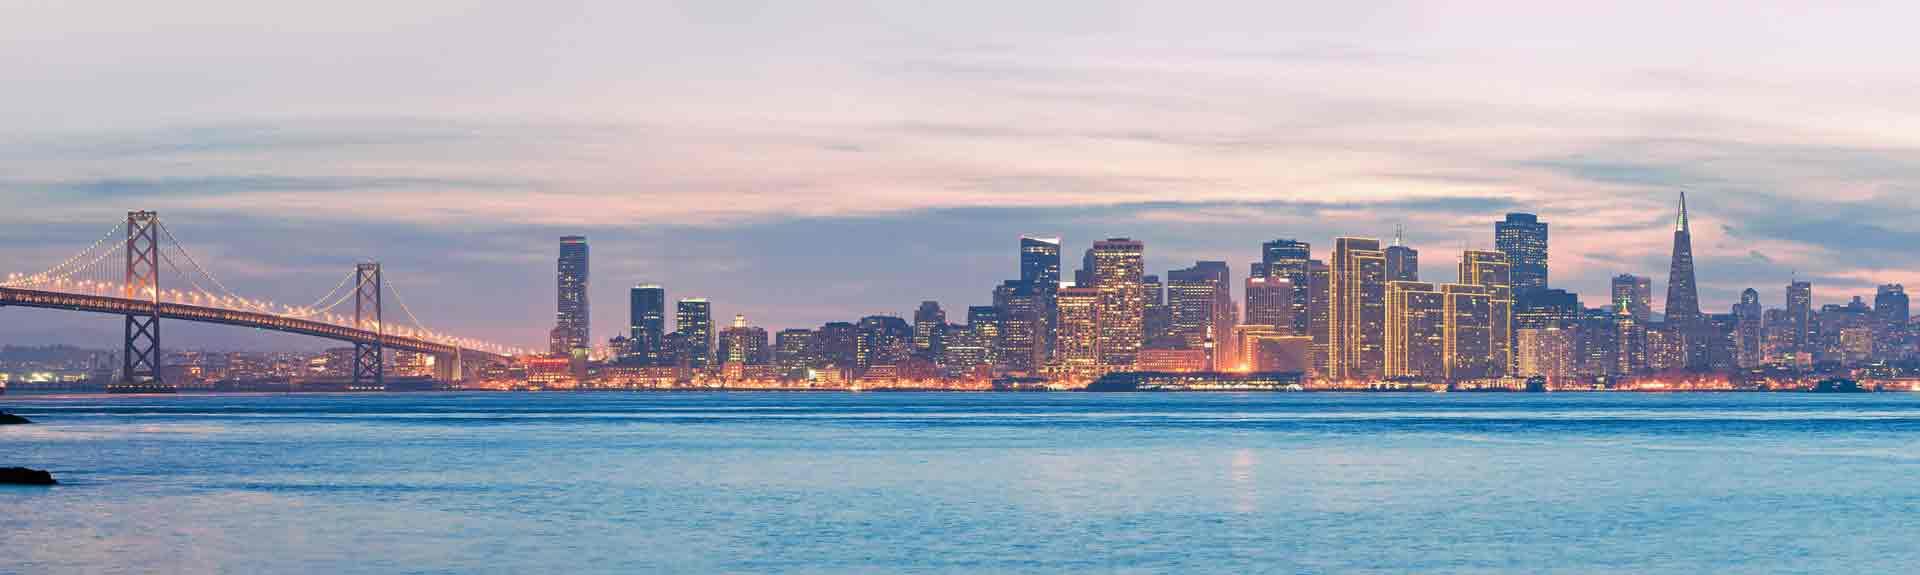 High resolution panorama of San Francisco Skyline and Bay Bridge